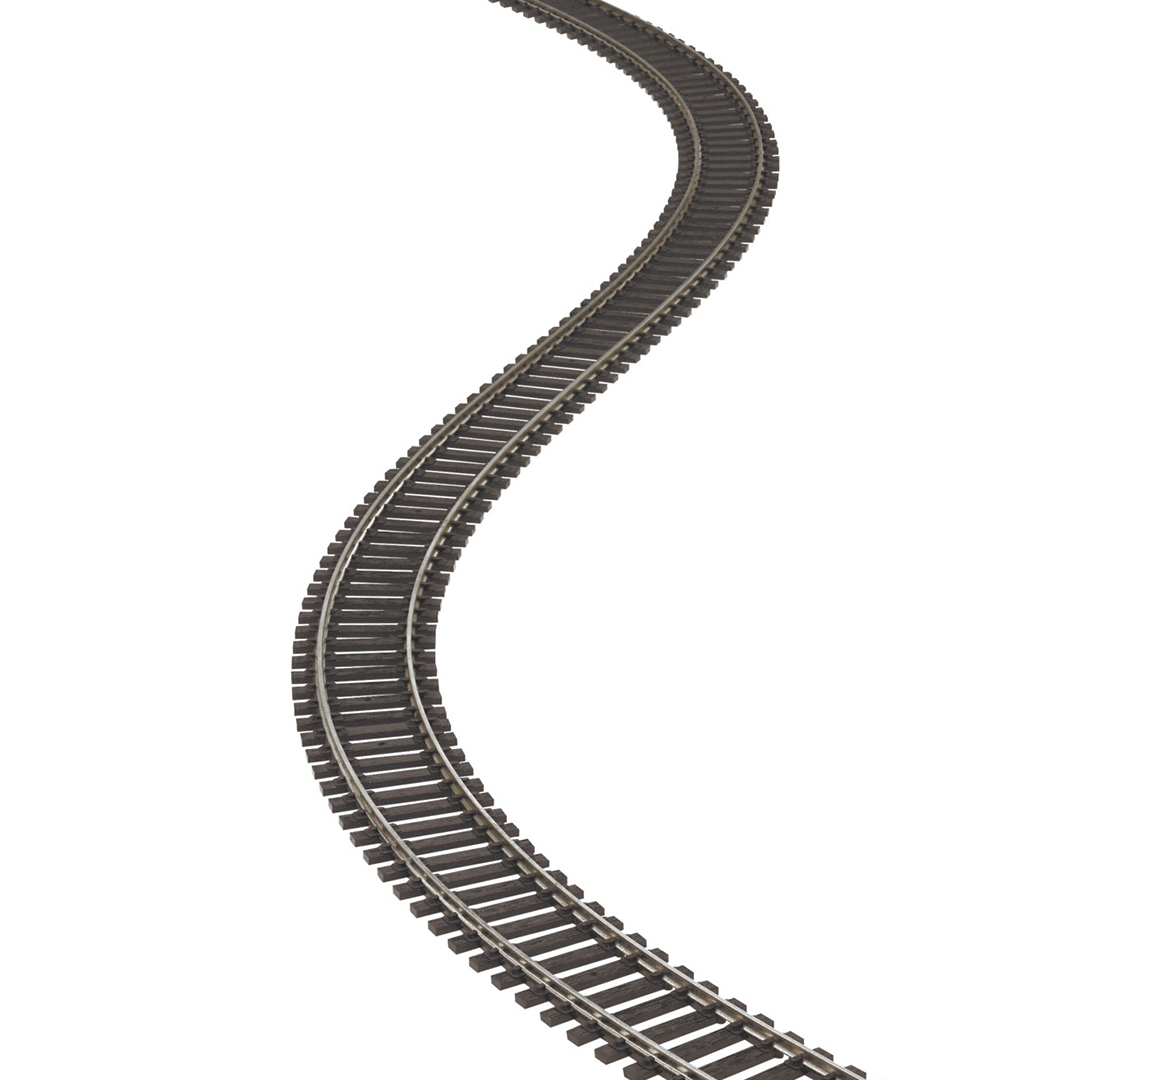 how to cut ho flex track